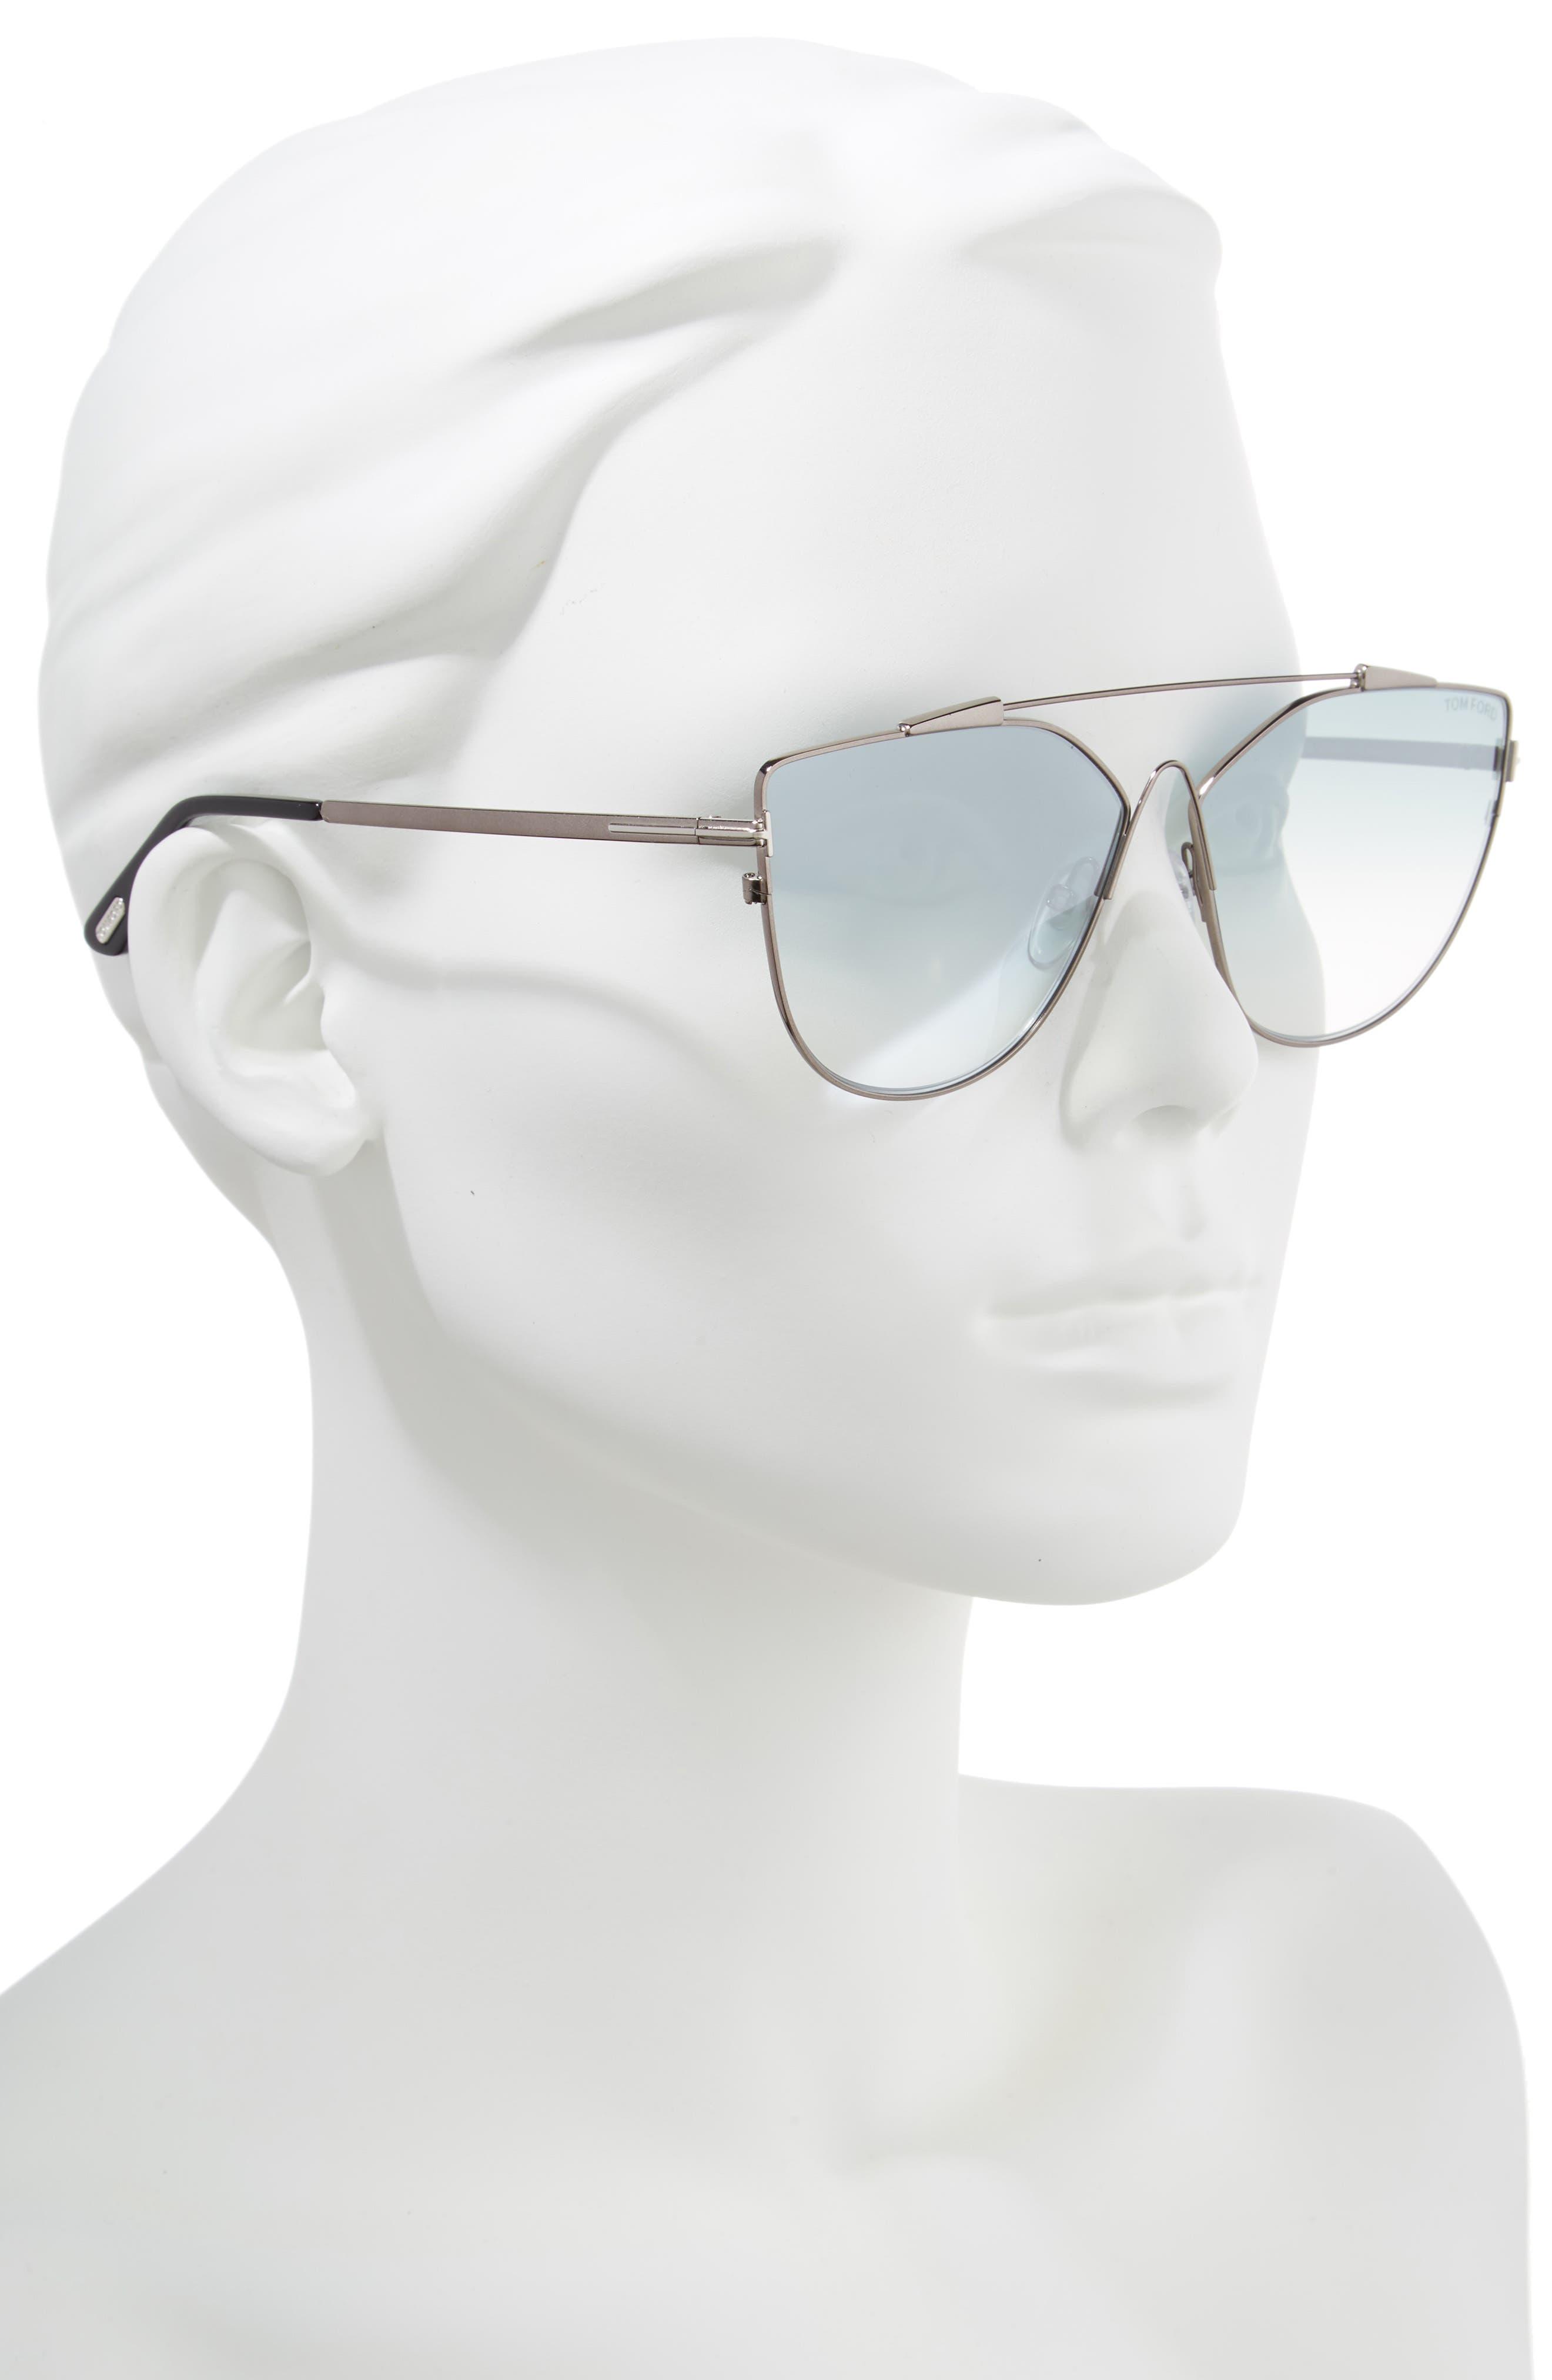 Jacquelyn 64mm Cat Eye Sunglasses,                             Alternate thumbnail 2, color,                             Light Ruthenium/ Blue Mirror